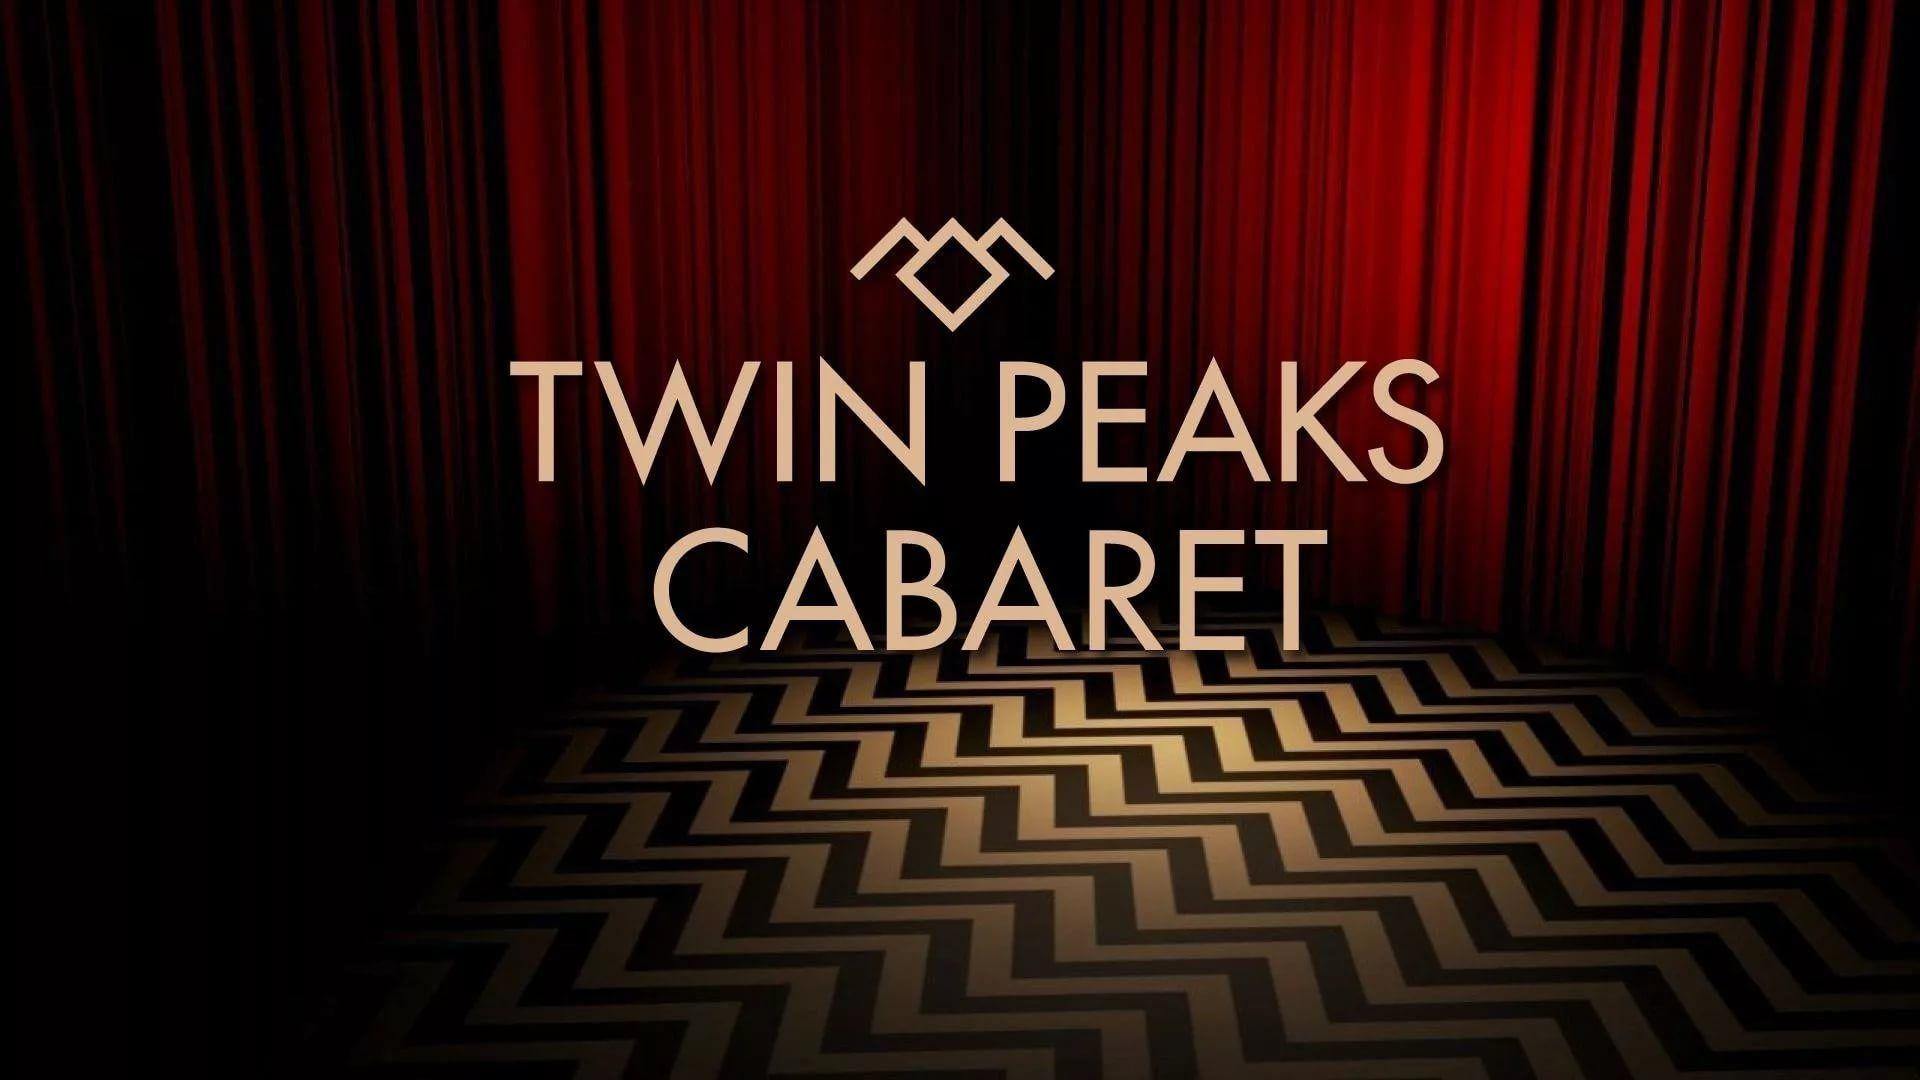 Twin Peaks wallpaper photo full hd